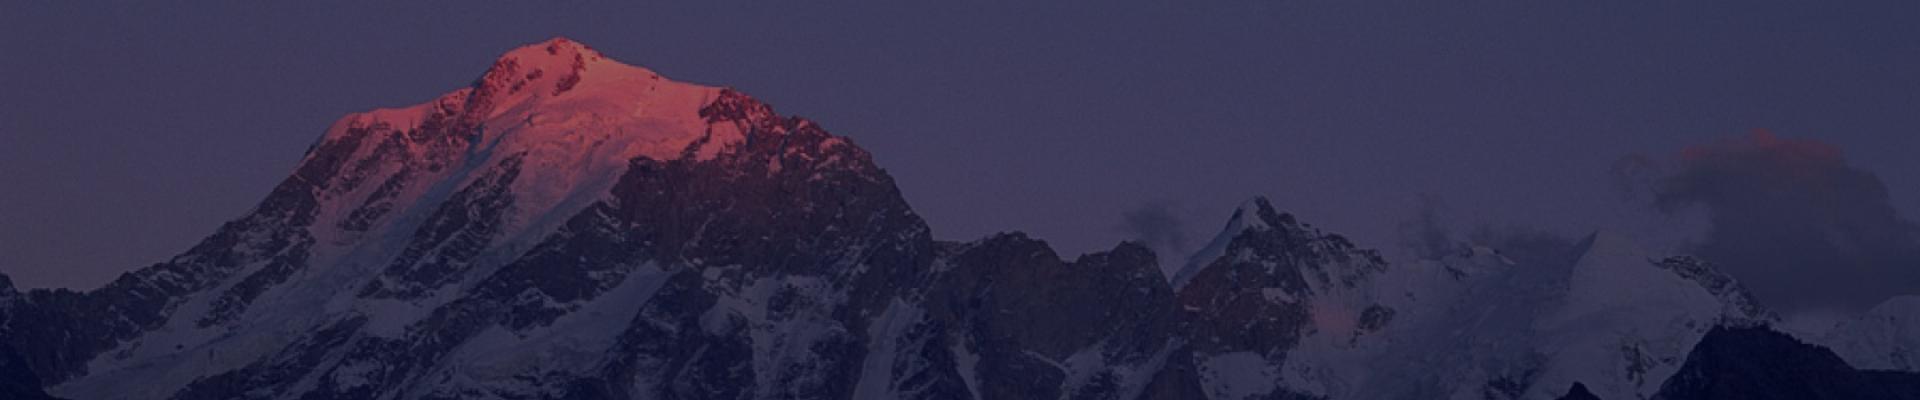 Gokyo Ri Trek, Nepal